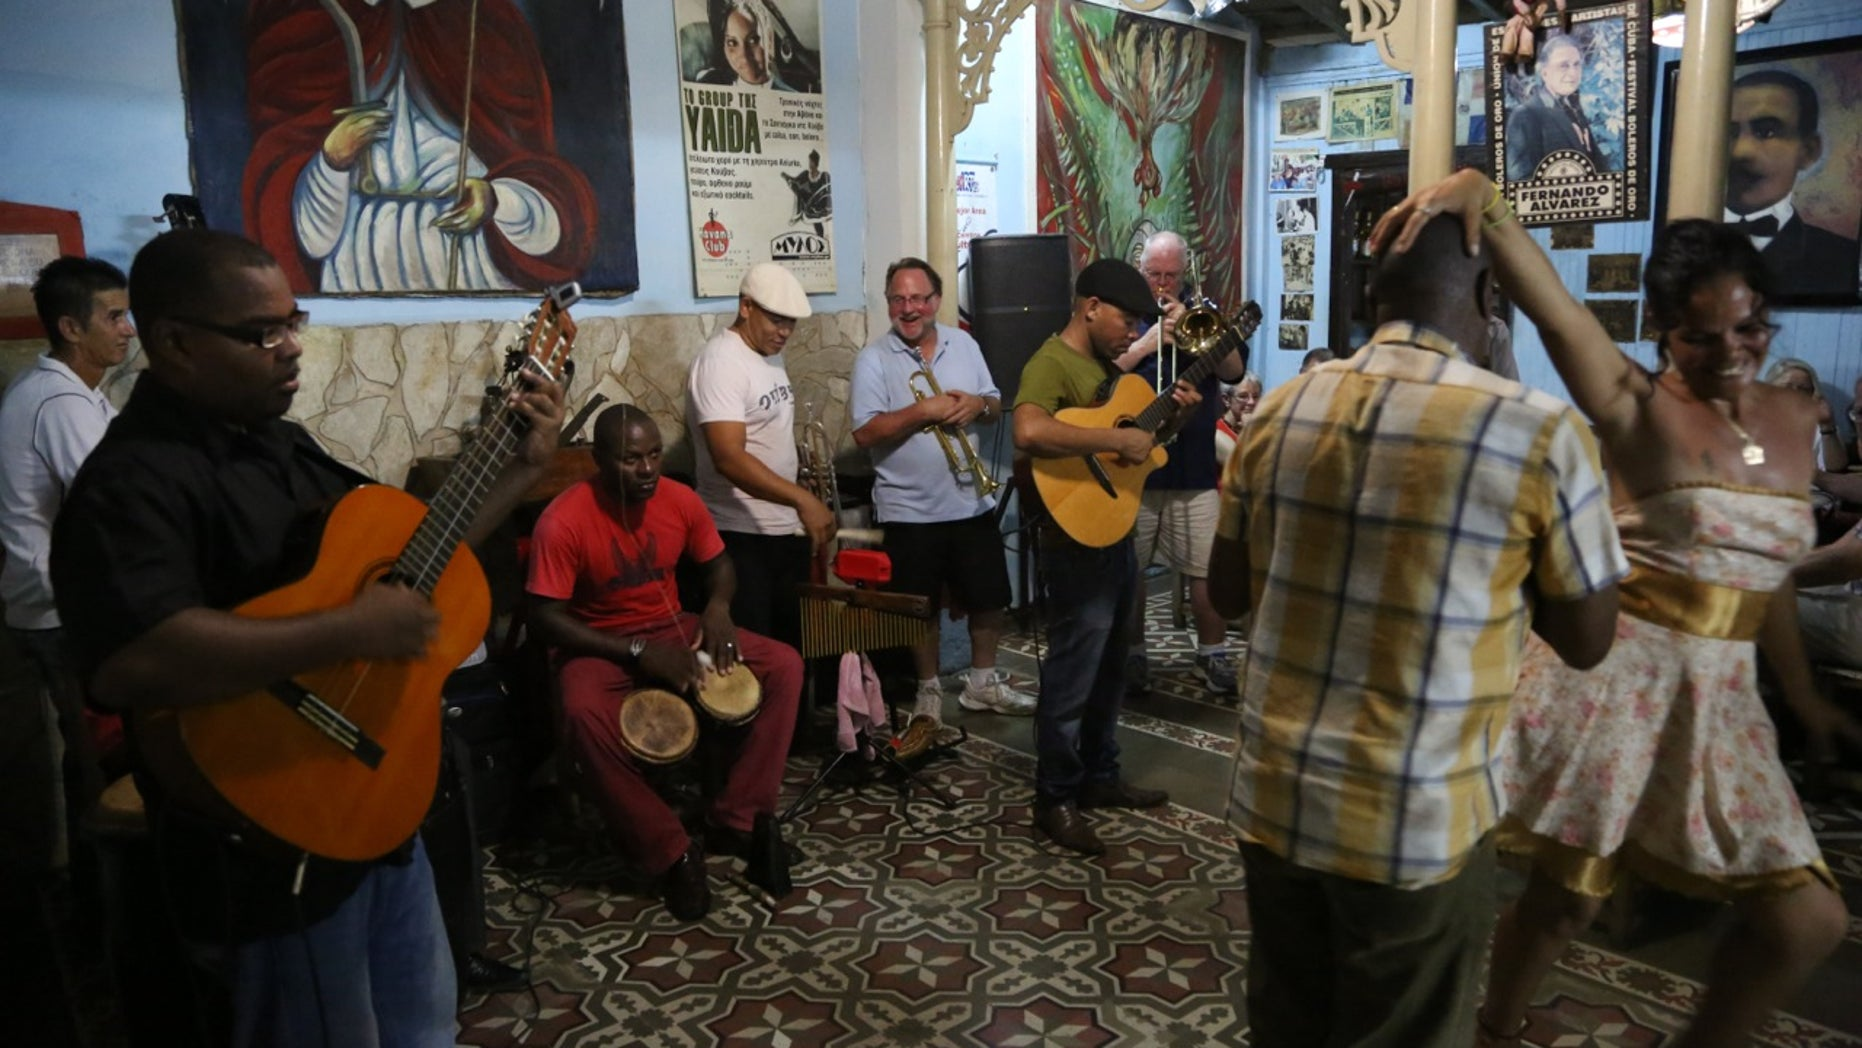 Dr. Mike Davison (light blue shirt) plays his trumpet alongside Cuban musicians at Casa de las Tradiciones, a club in Santiago de Cuba. (Photo by Brian Ross)